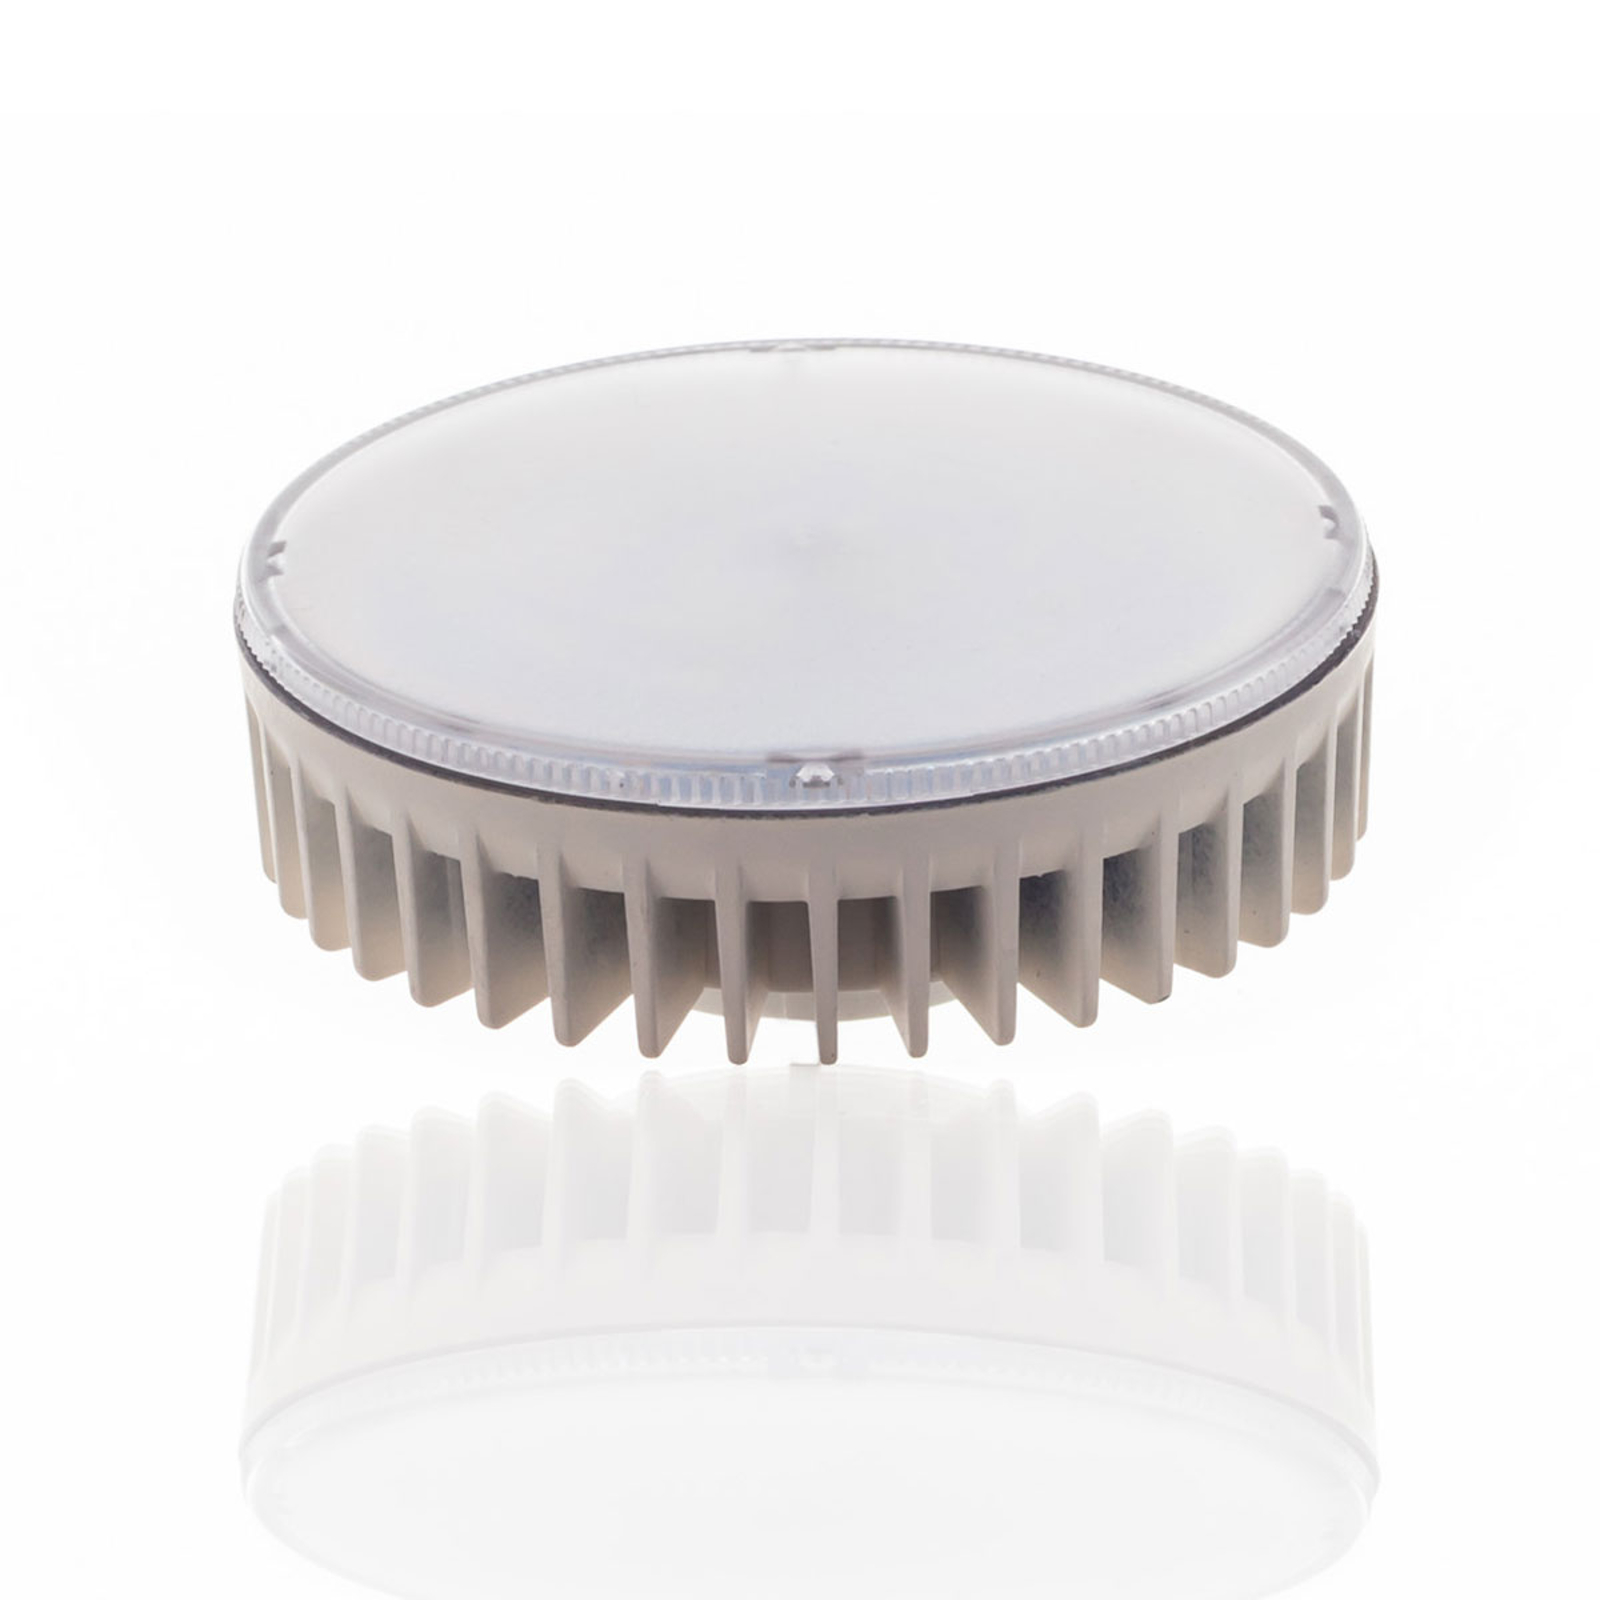 GX53 10W żarówka LED 1200lm - ciepła biel